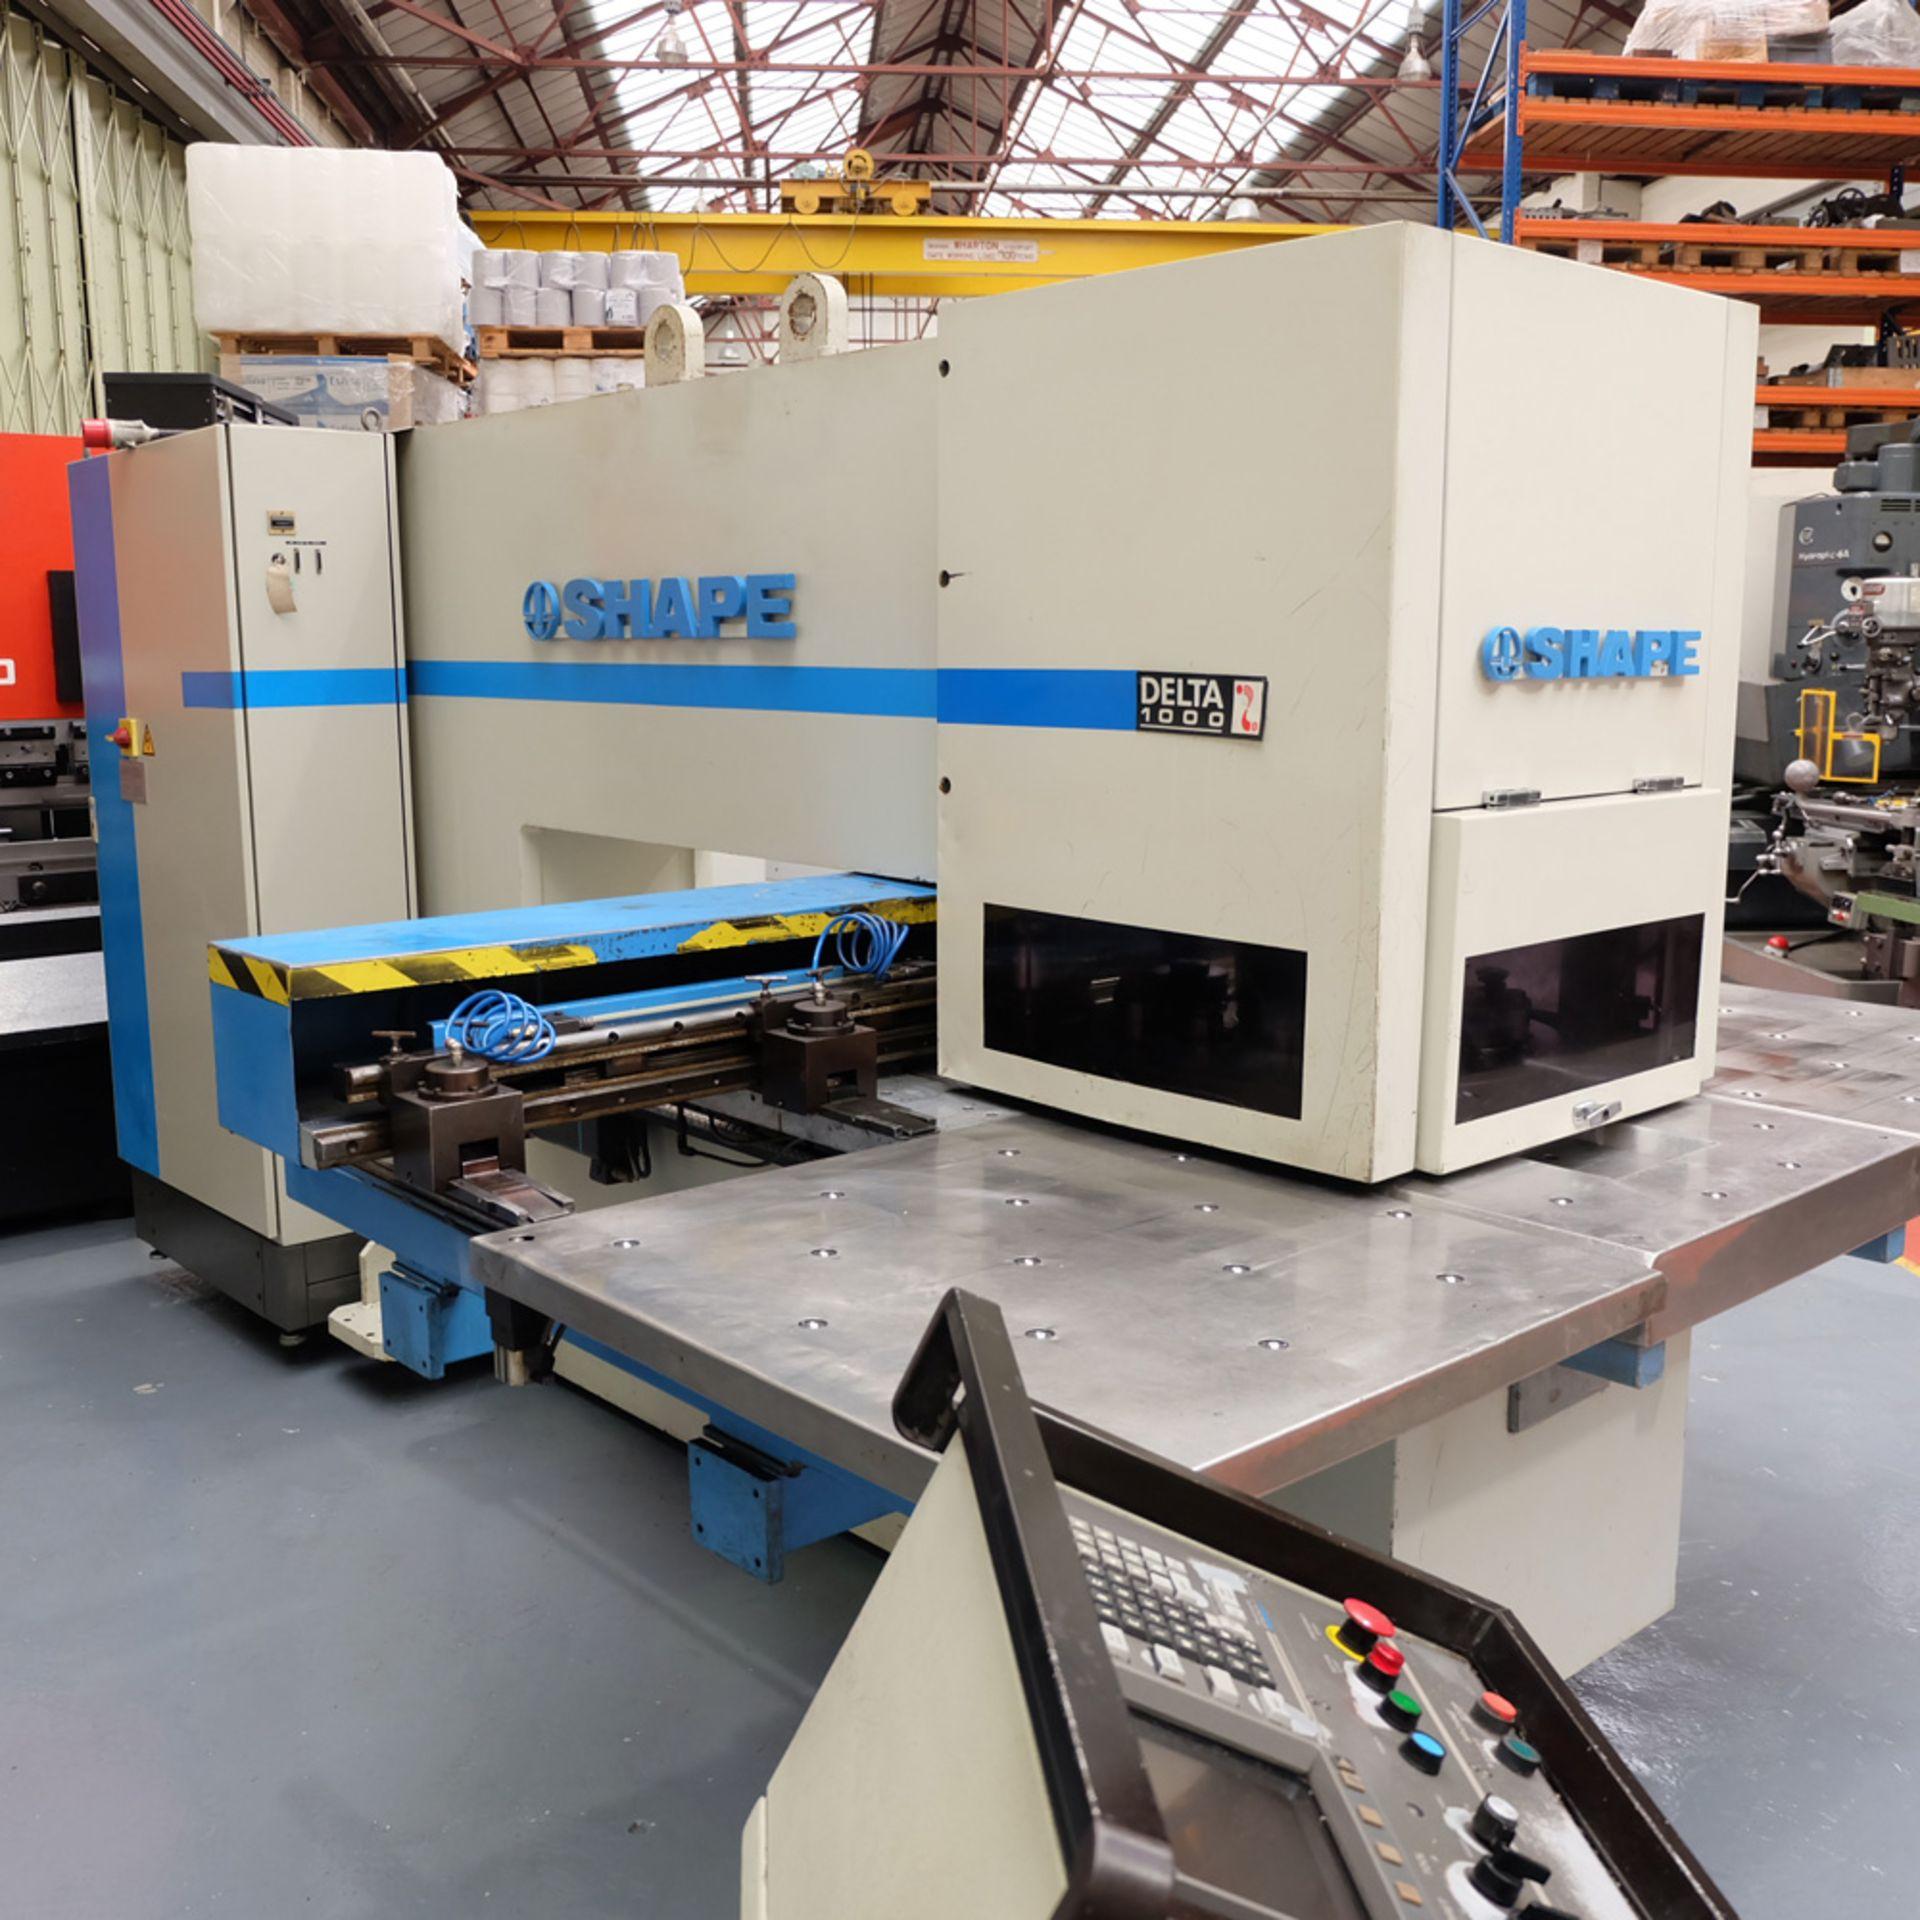 LVD Shape Delta 1000 Thick CNC Turret Punching Machine. - Image 6 of 18